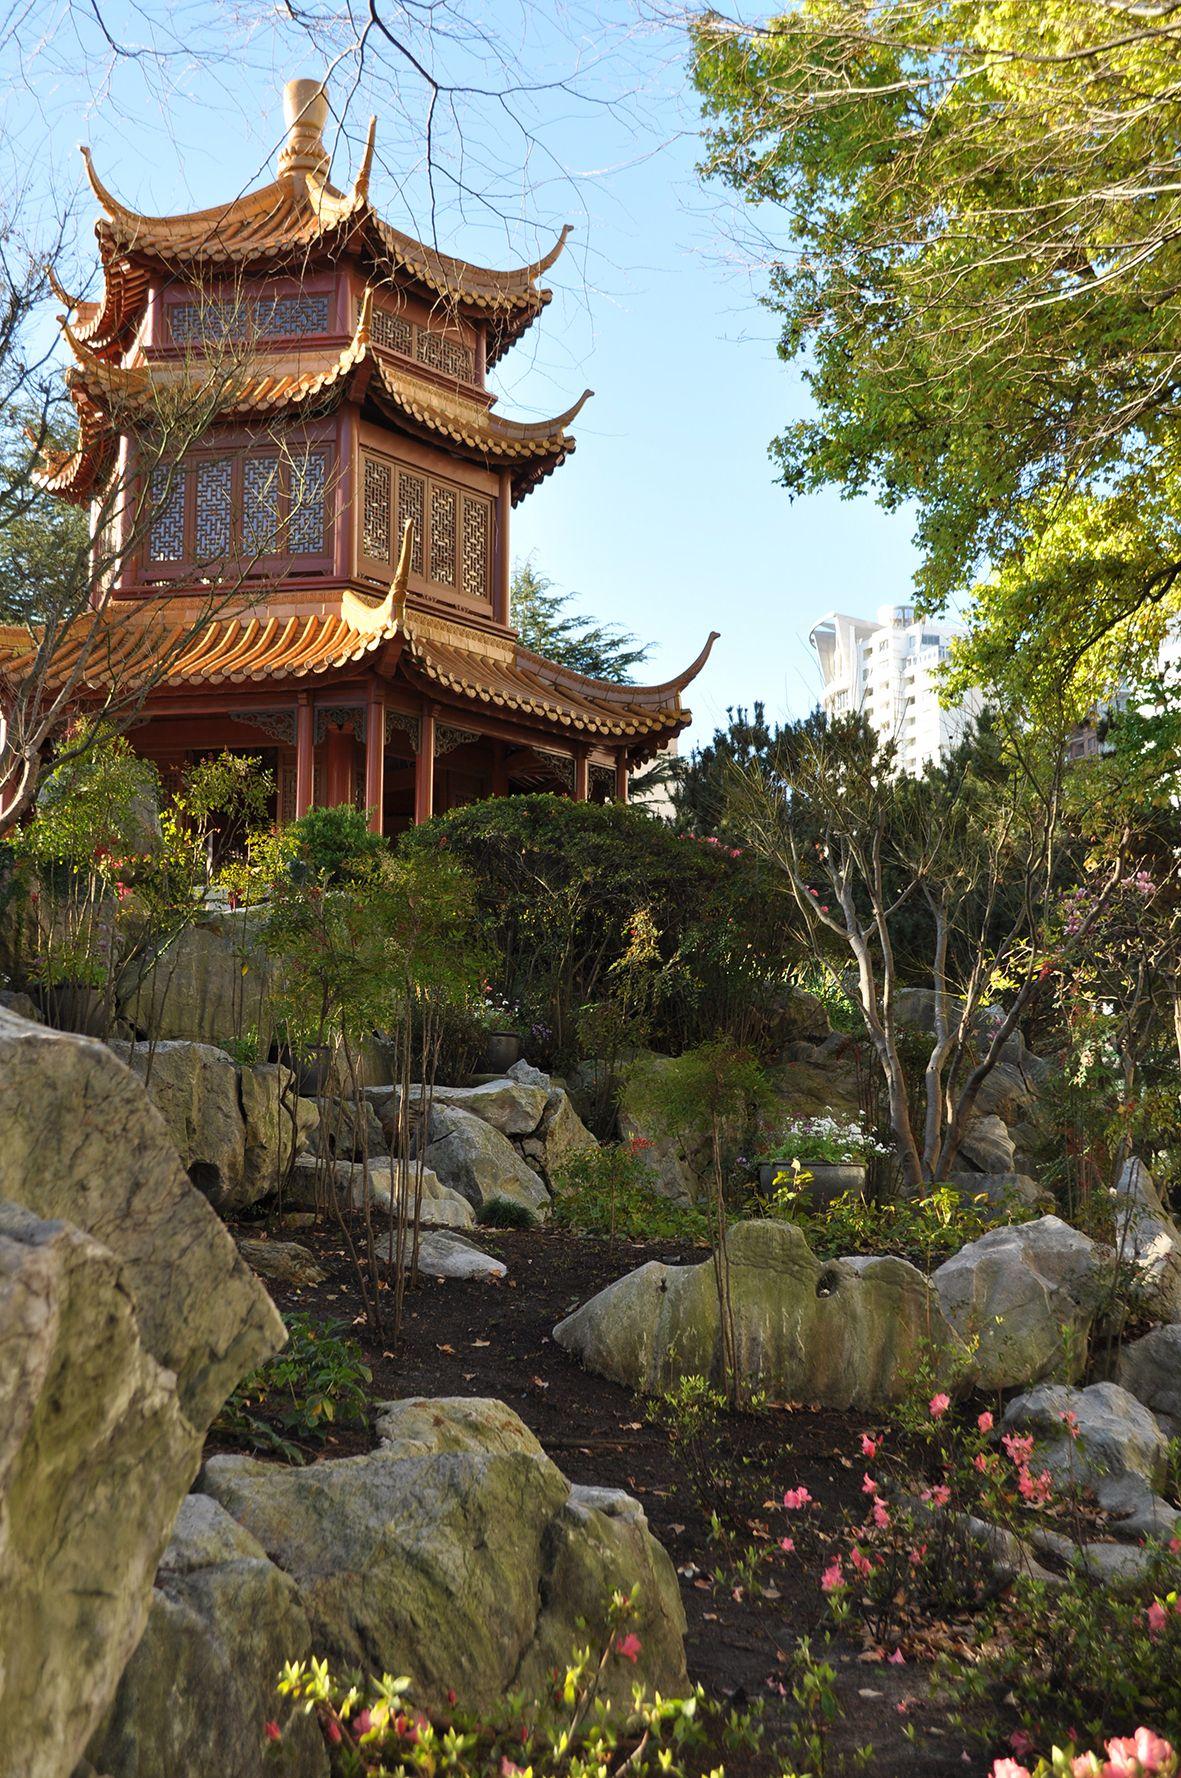 Chinese Garden - Sydney - Australia | My trips | Pinterest | Chinese ...